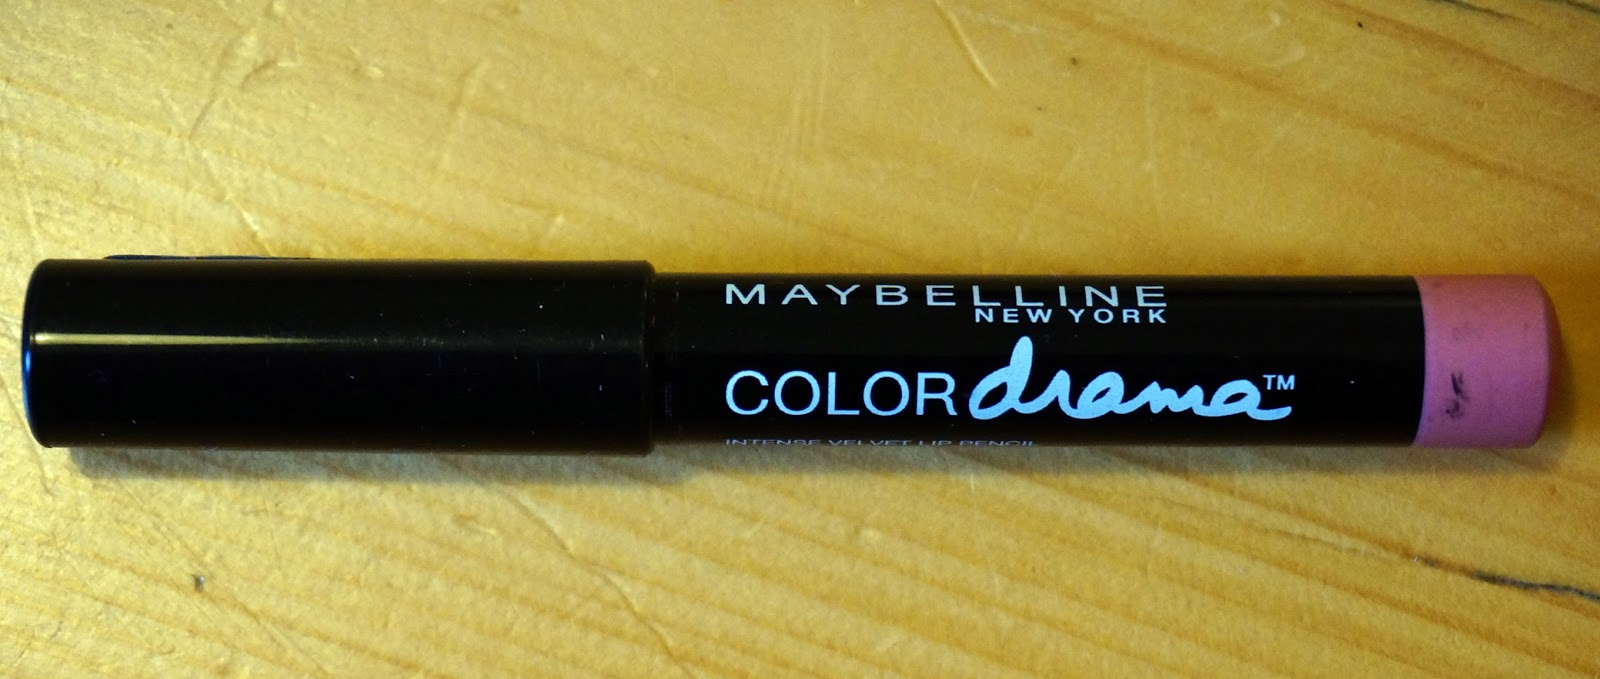 Maybelline Colourdrama in 140 Minimalist